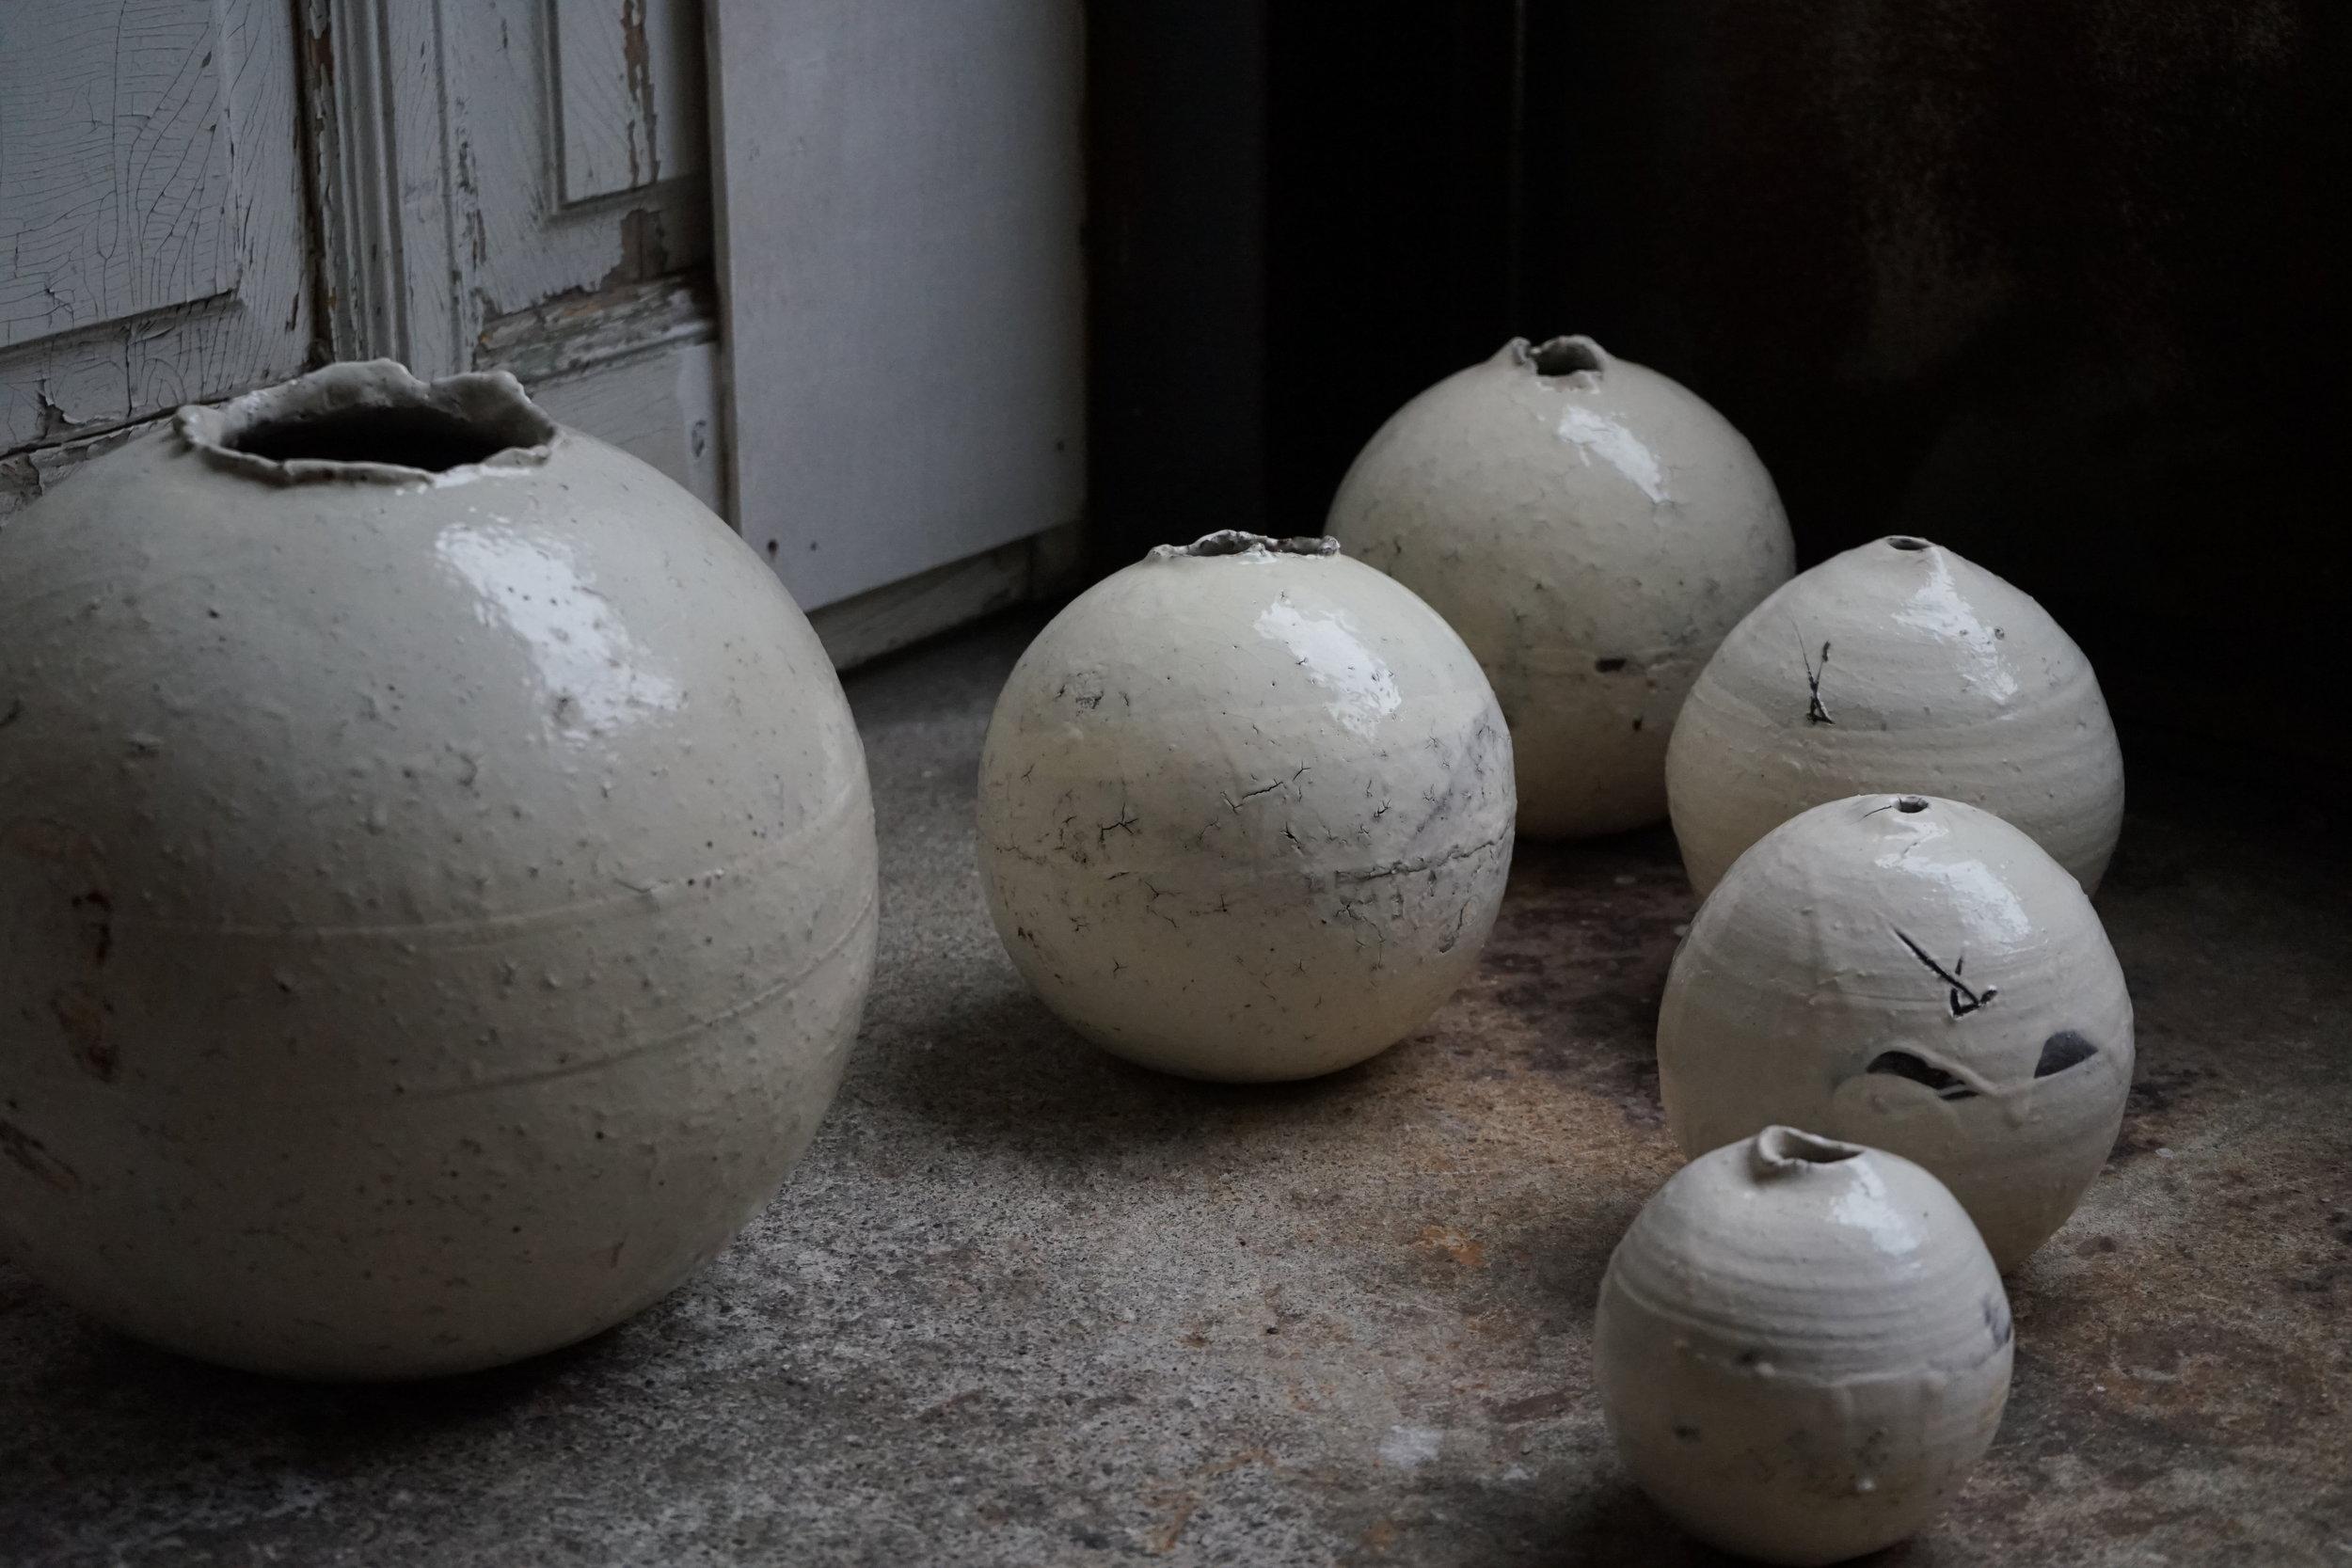 辻村史朗の粉引丸壷 | Kohiki round jar by Shiro Tsujimura